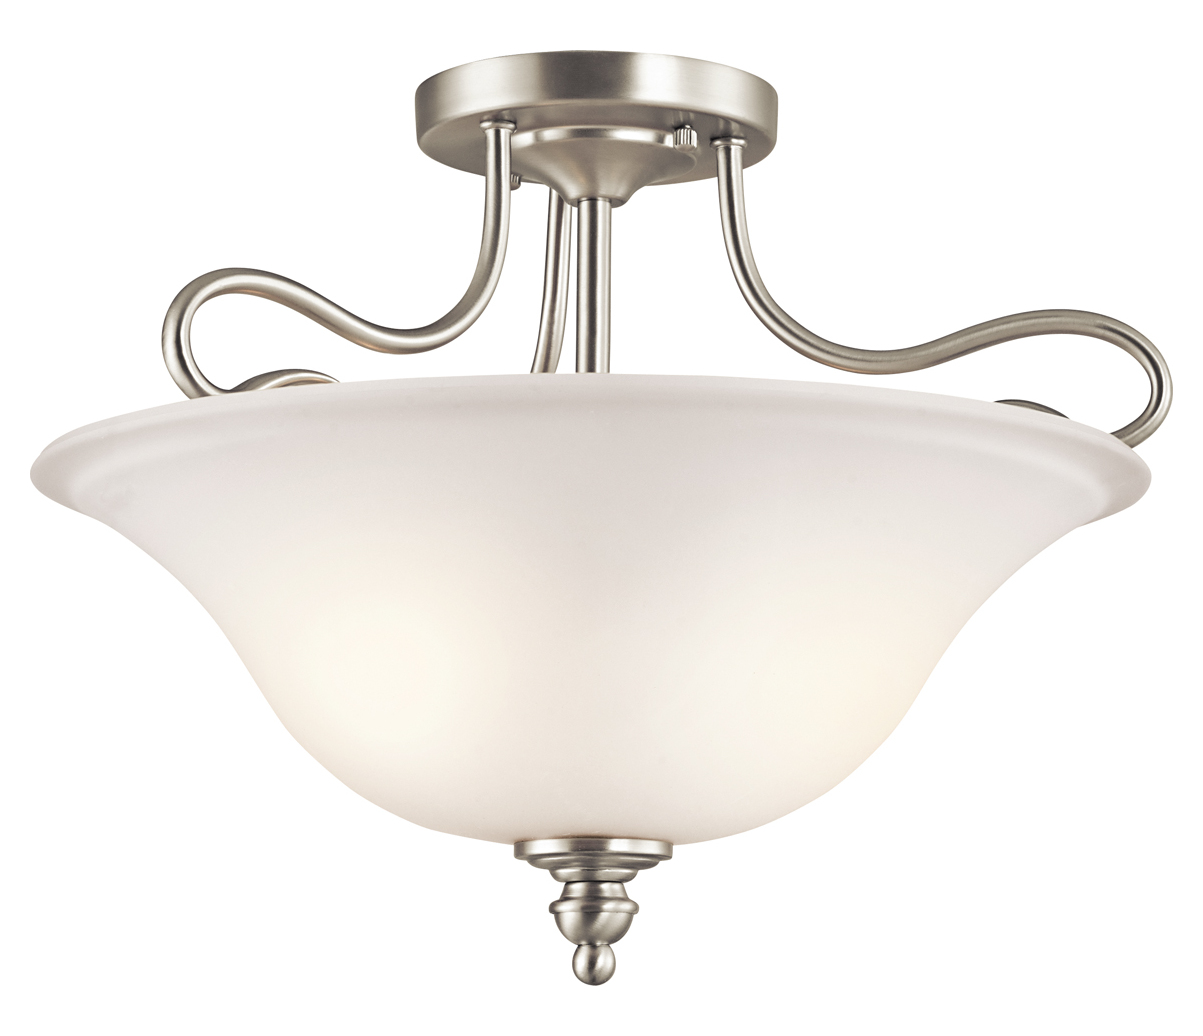 2 Light Ceiling Fixture: Kichler Brushed Nickel Tanglewood 2 Light Semi-Flush